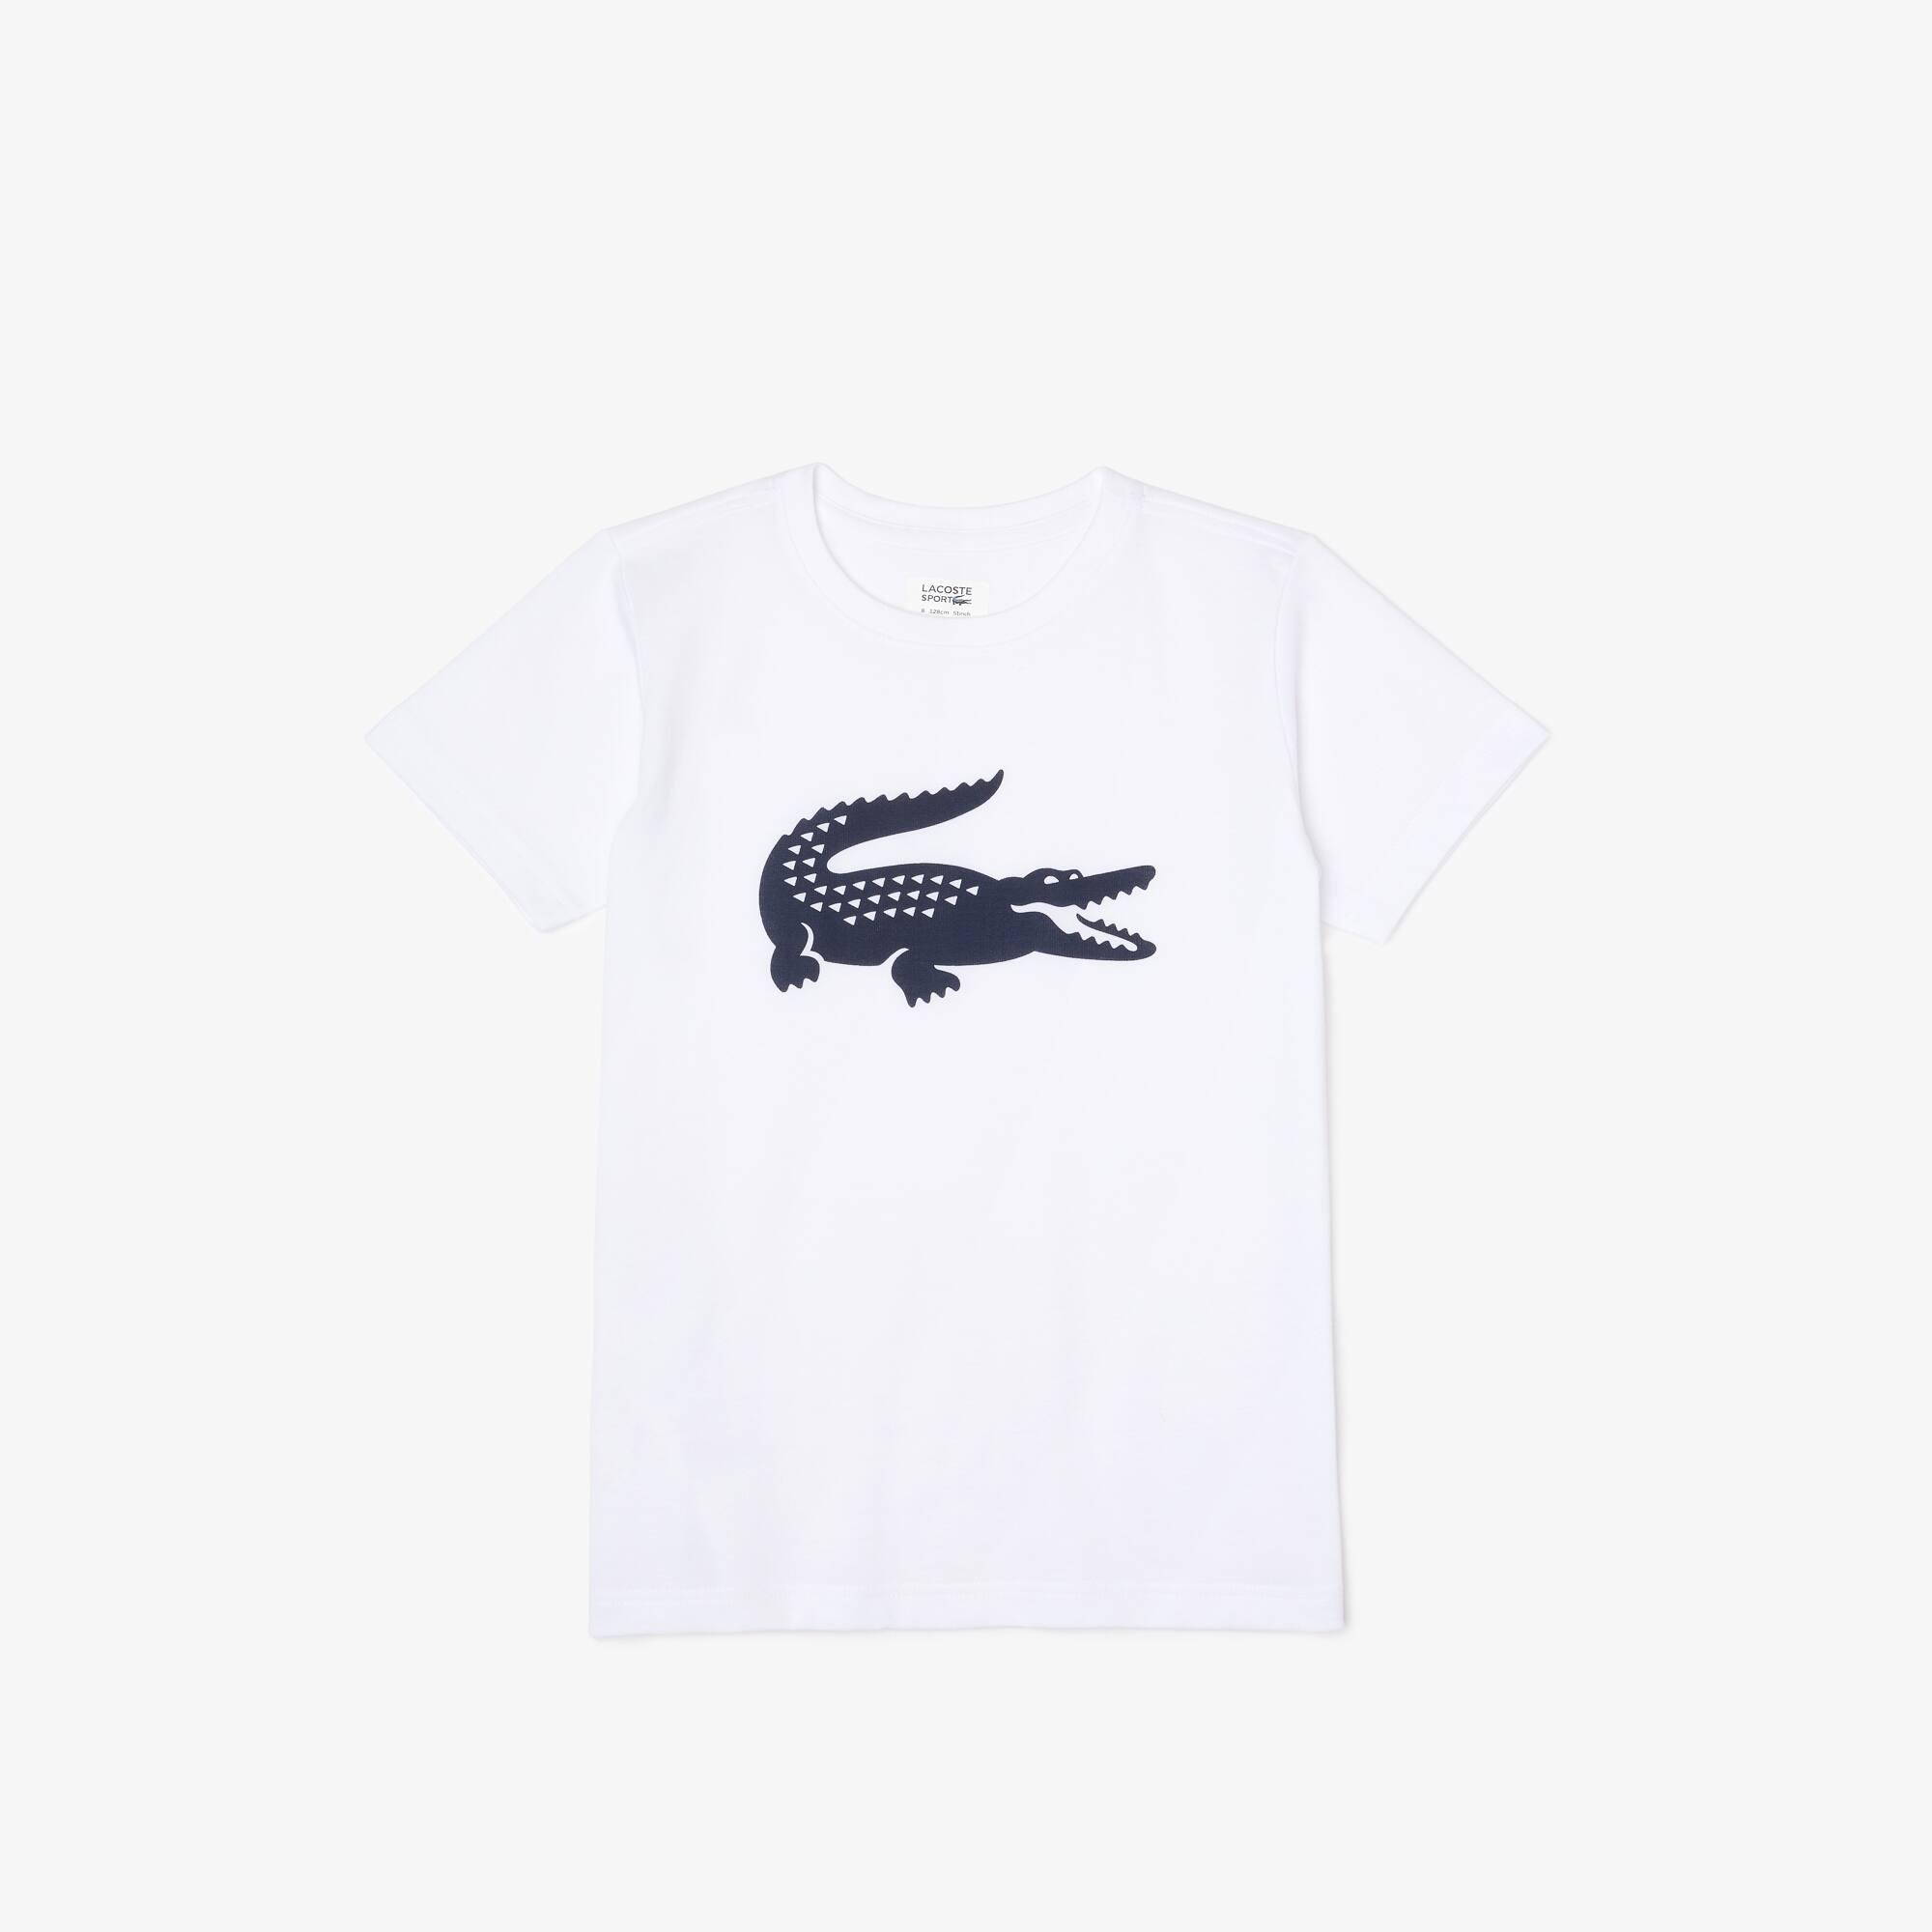 Camiseta infantil de tejido de punto técnico con gran cocodrilo Lacoste SPORT Tennis